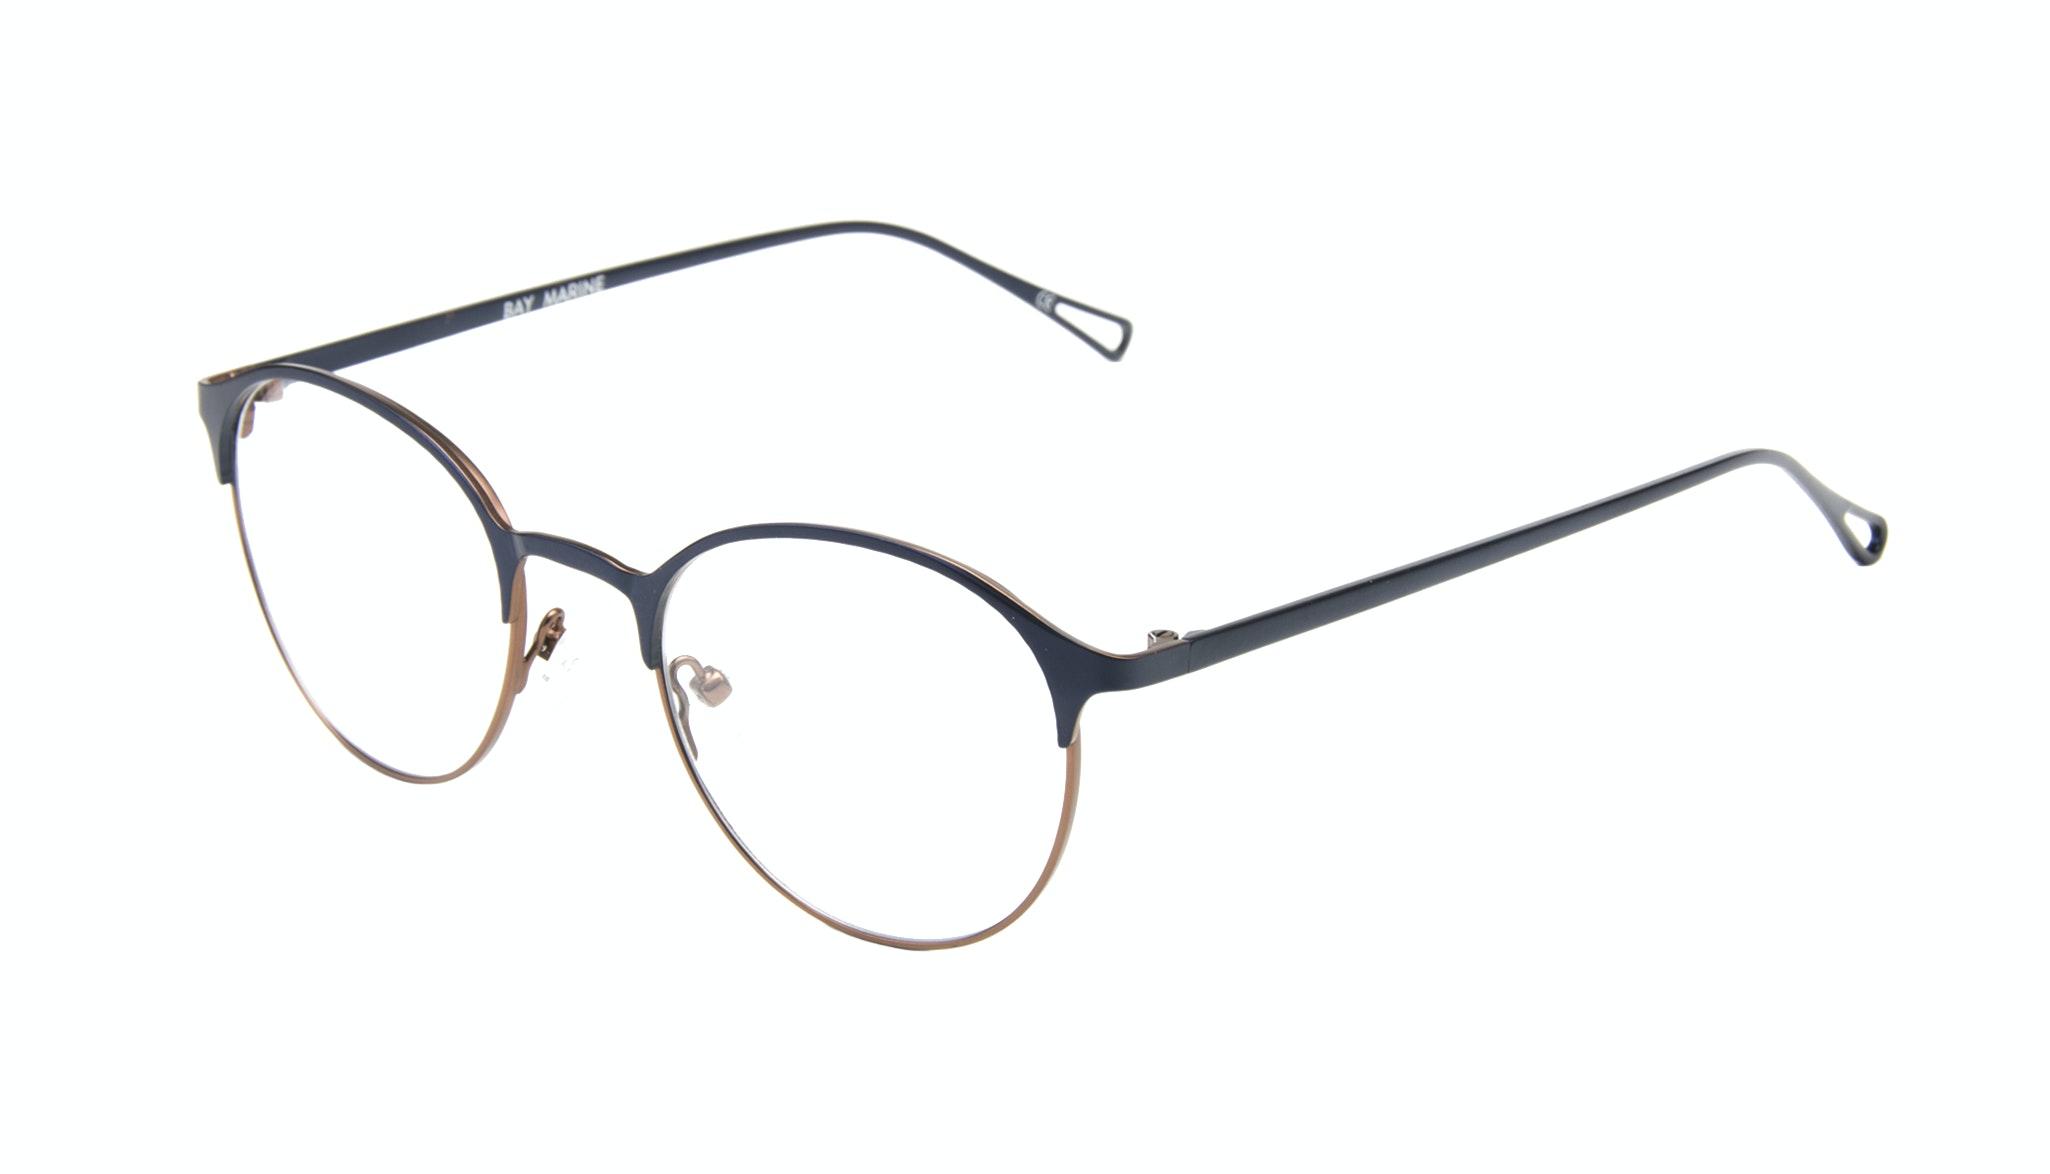 Affordable Fashion Glasses Round Eyeglasses Women Bay Marine Tilt